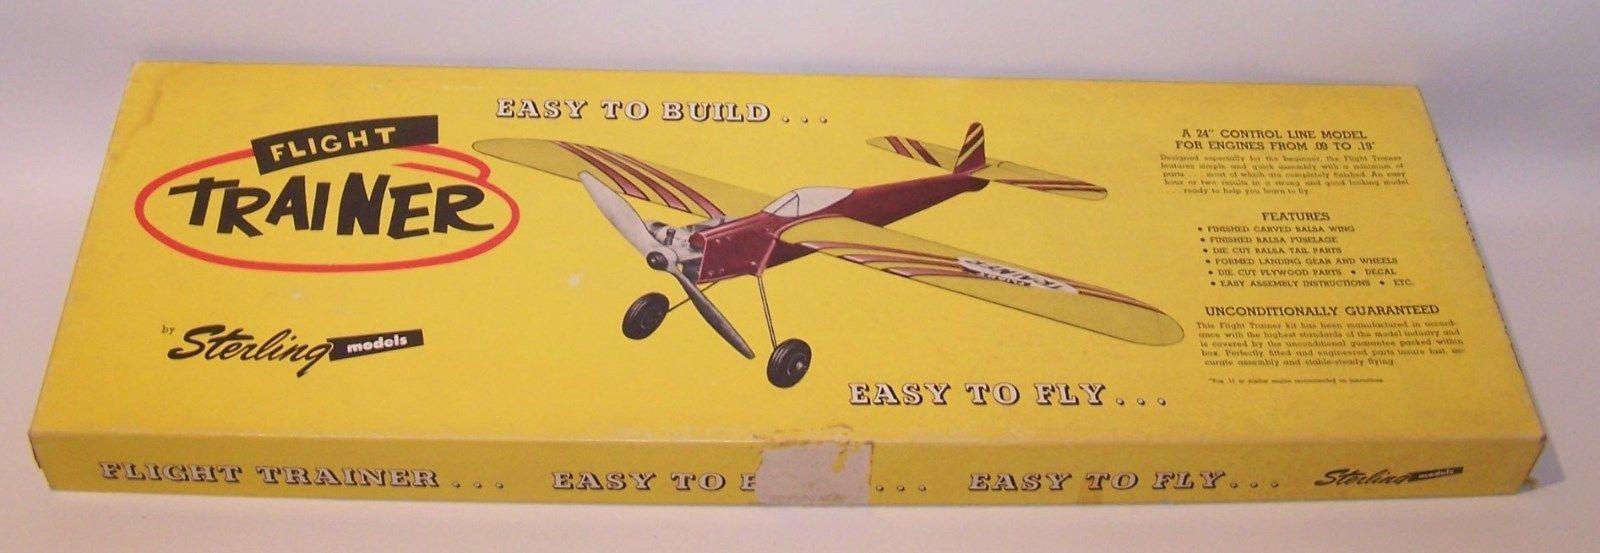 Vintage Airplane Kits 110